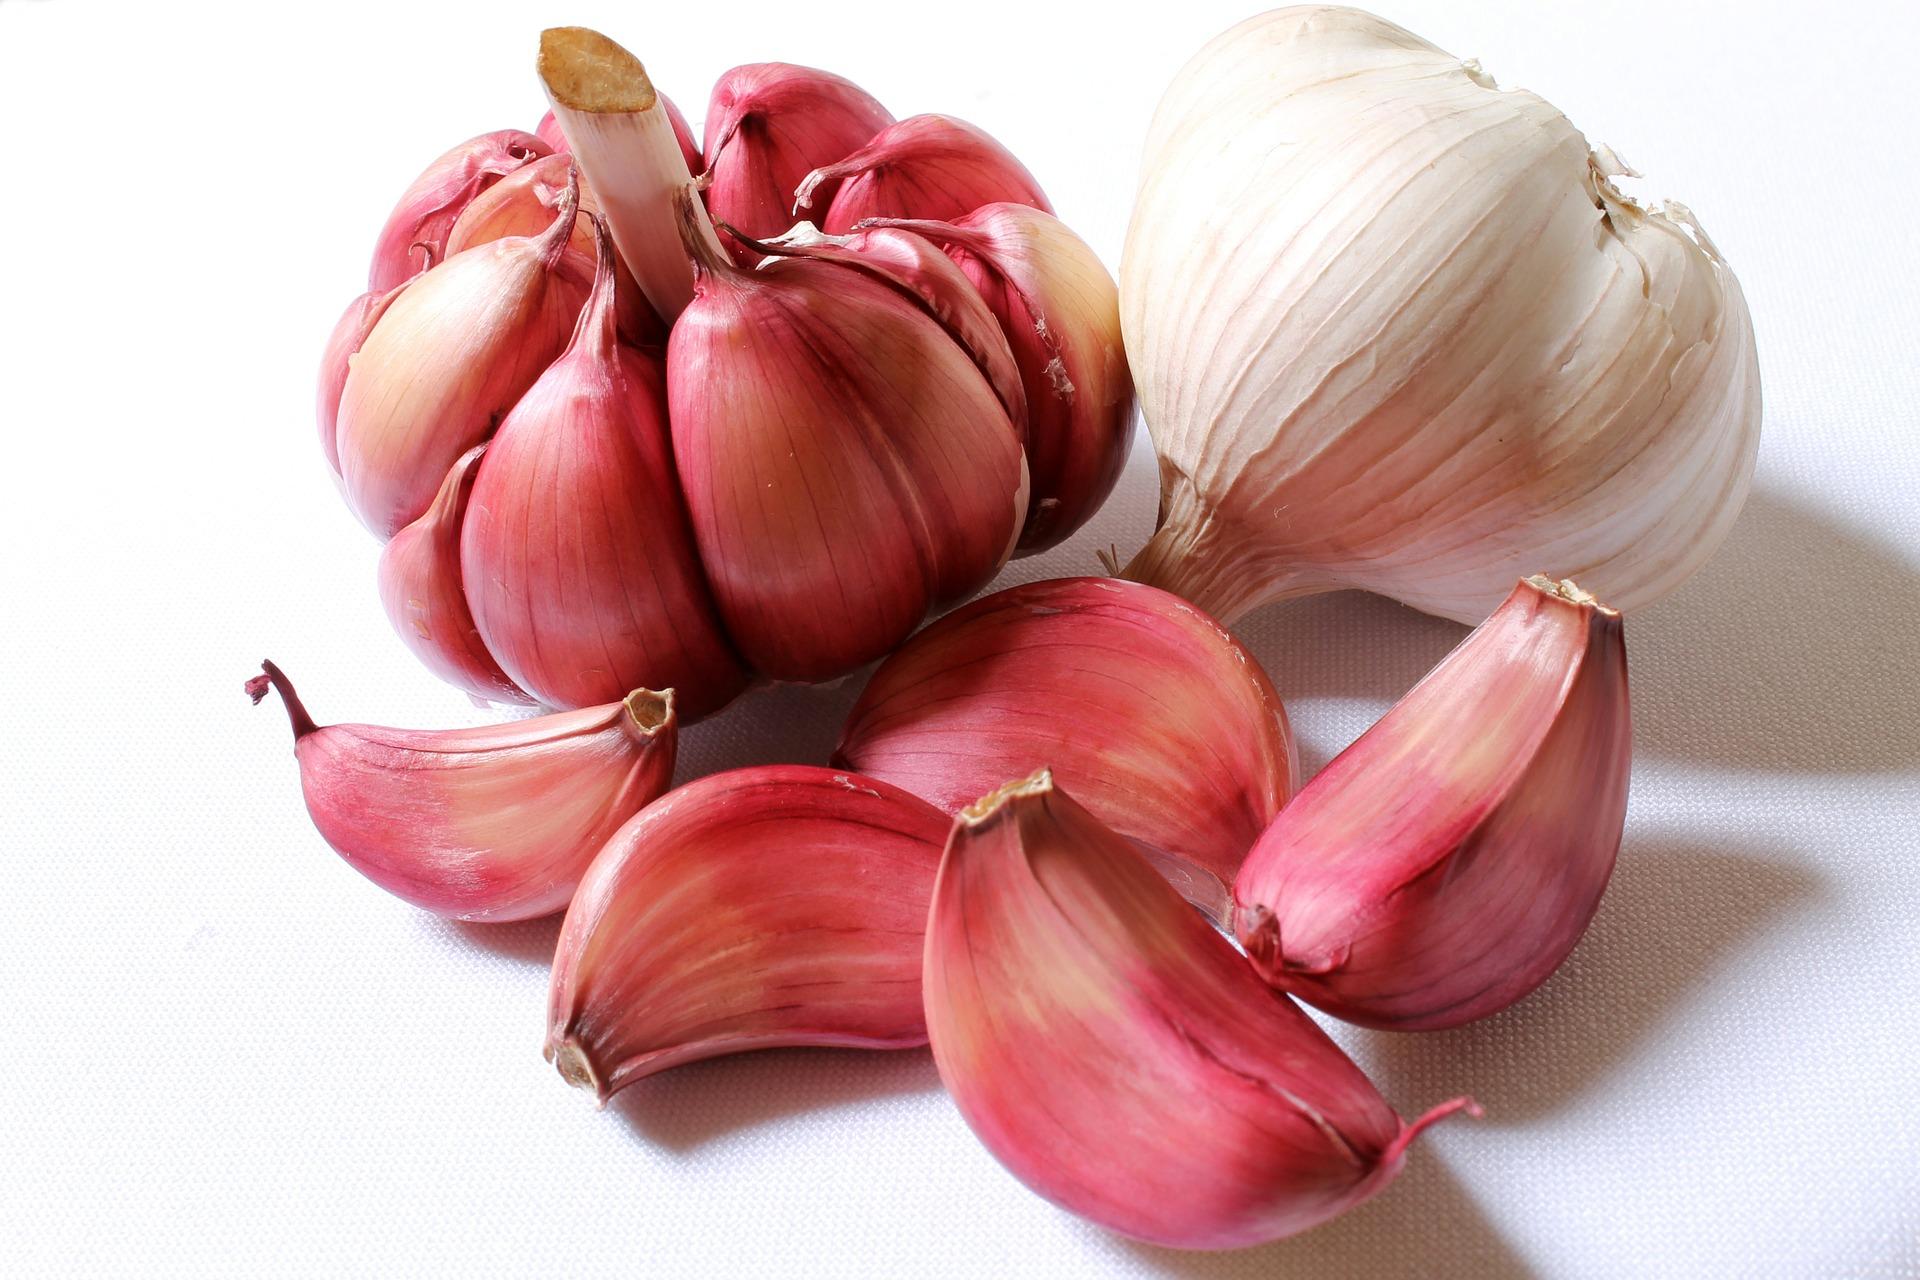 Does garlic make you sweat